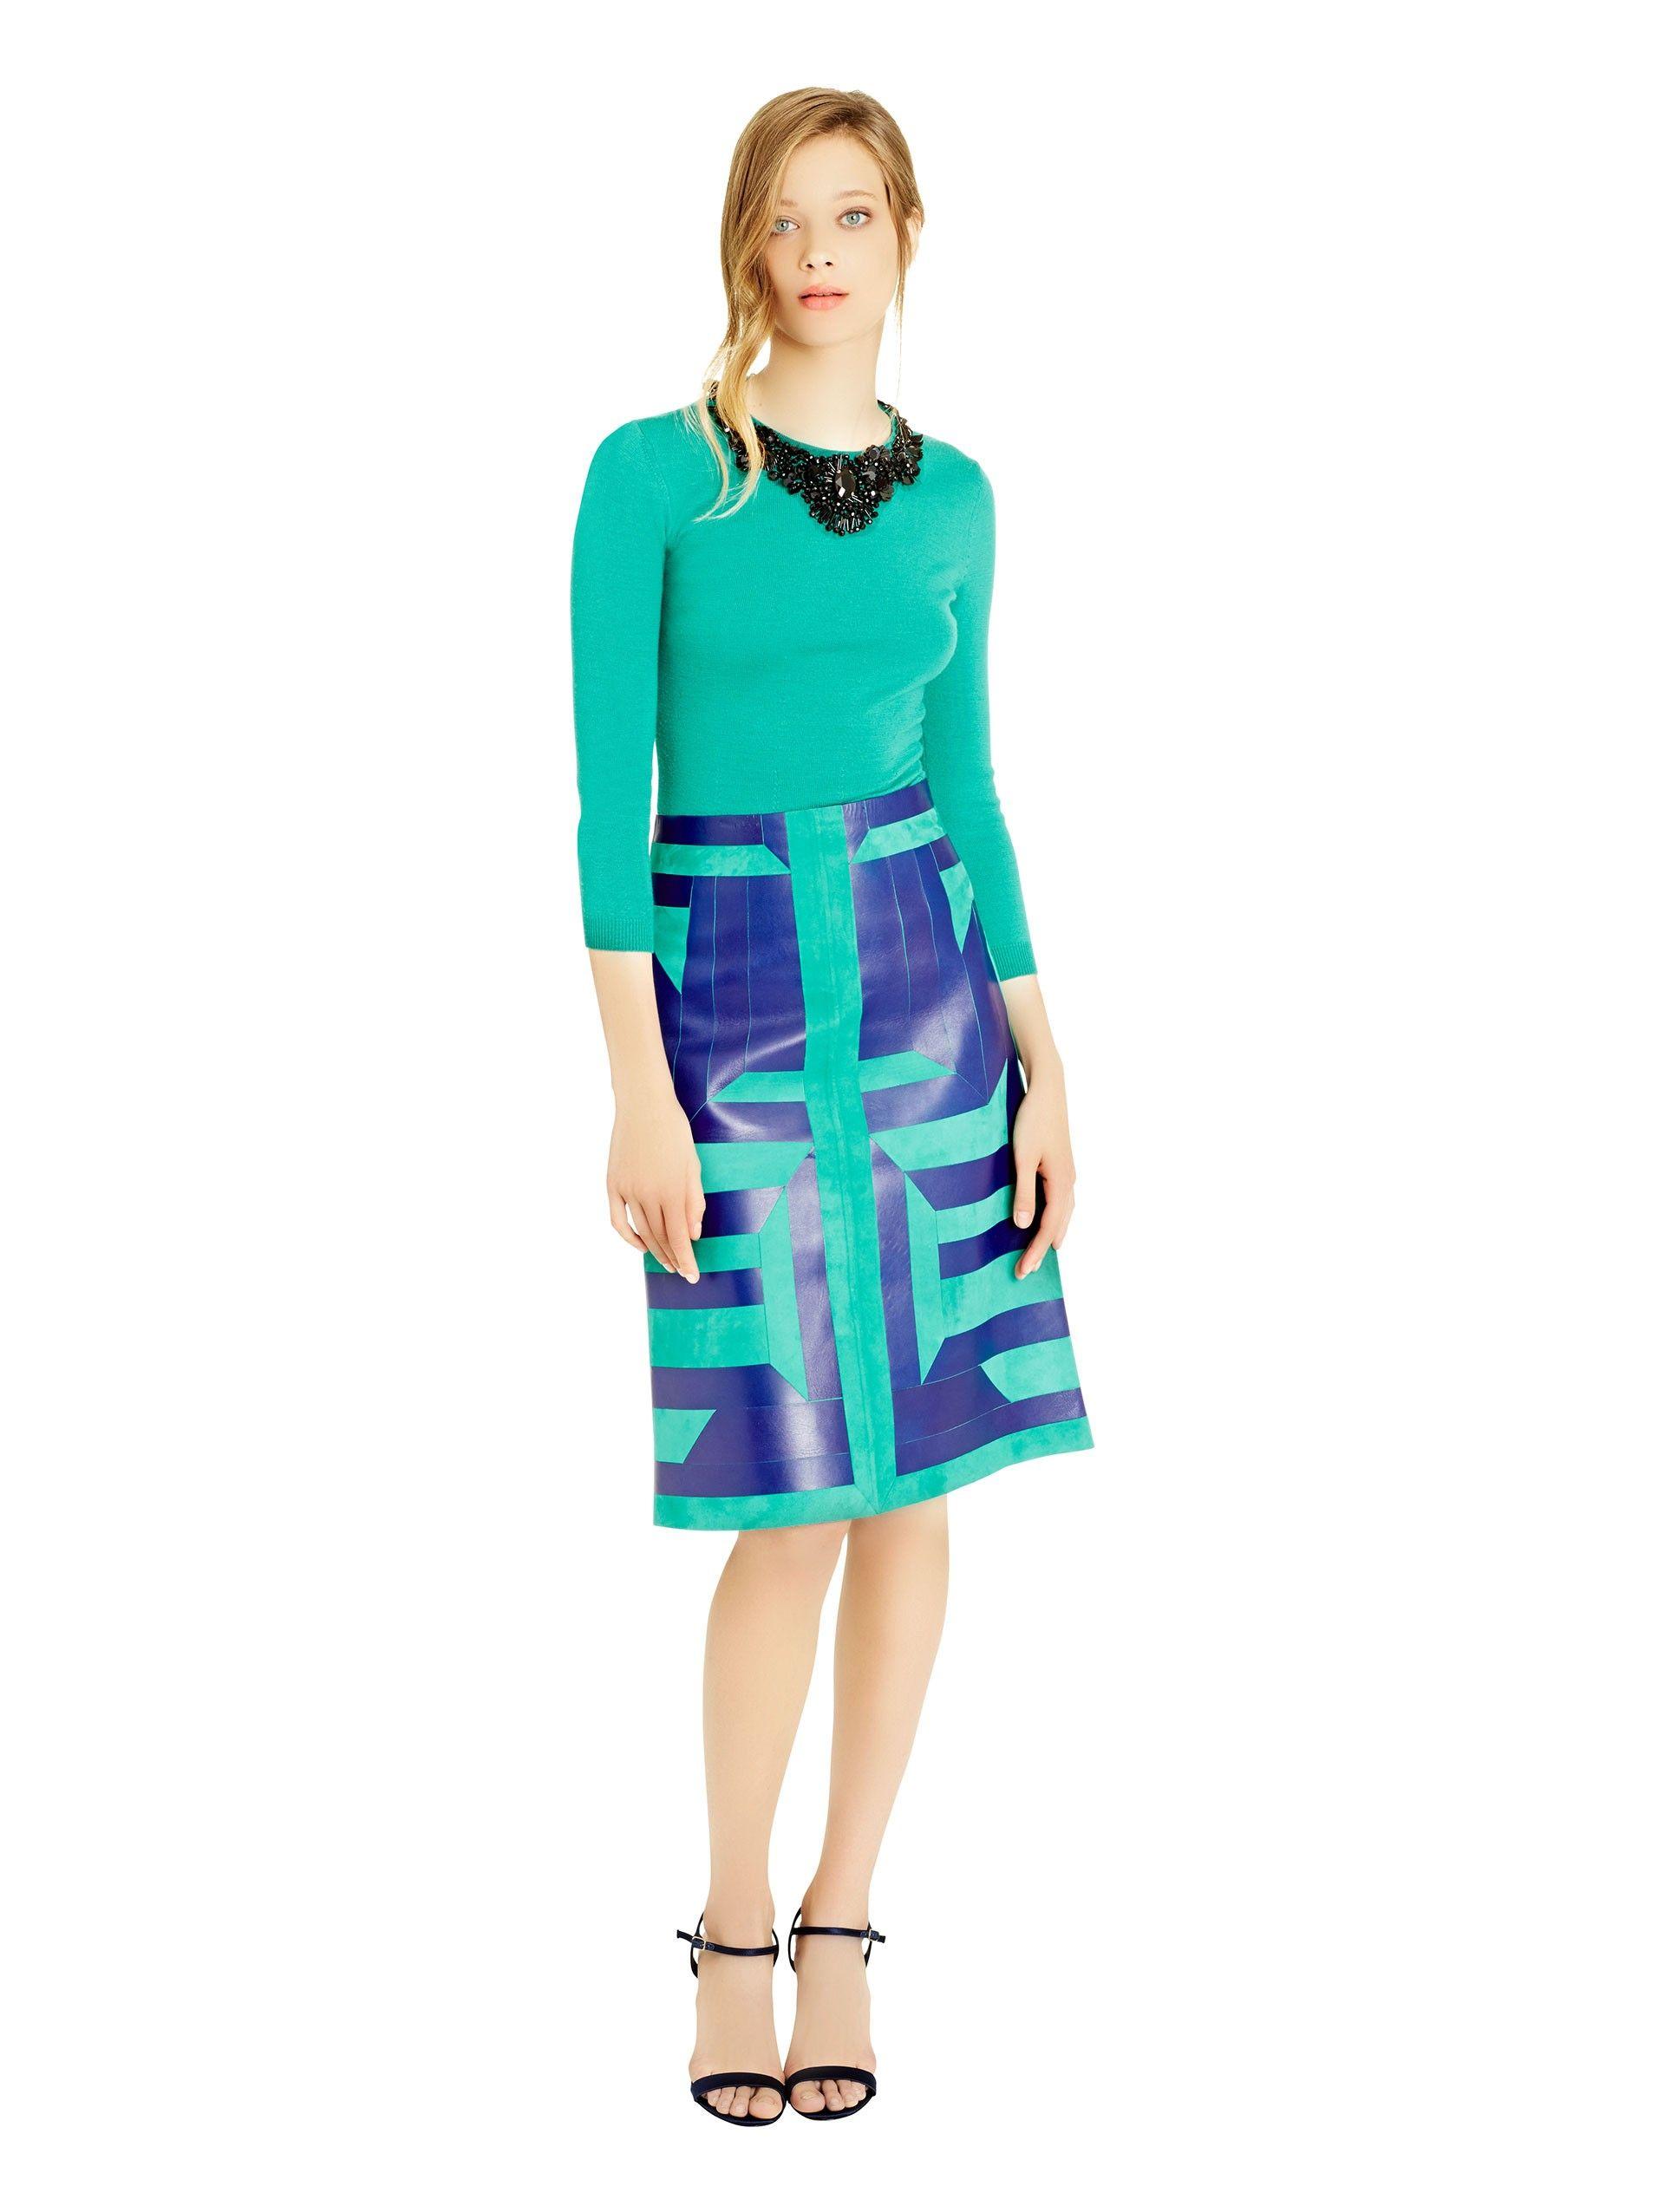 pretty modest outfit Oscar de la Renta - Bead Embroidered Peplum Pullover